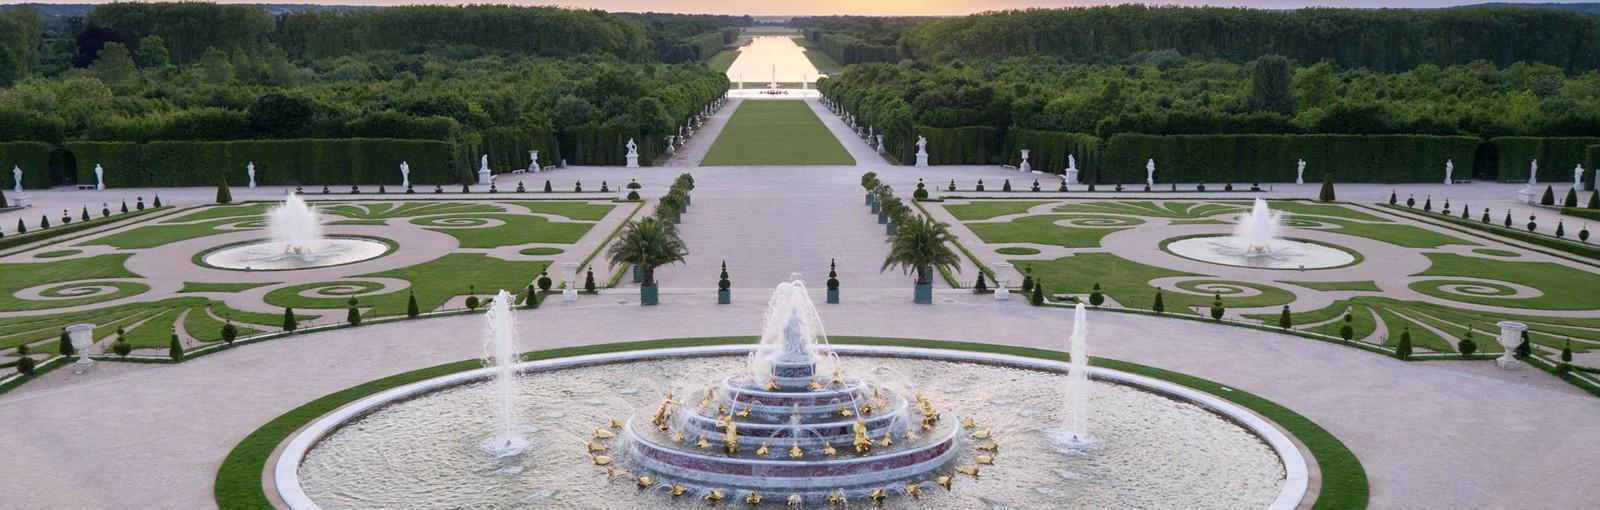 Tours Versailles half day tour - Half days - Day tours from Paris